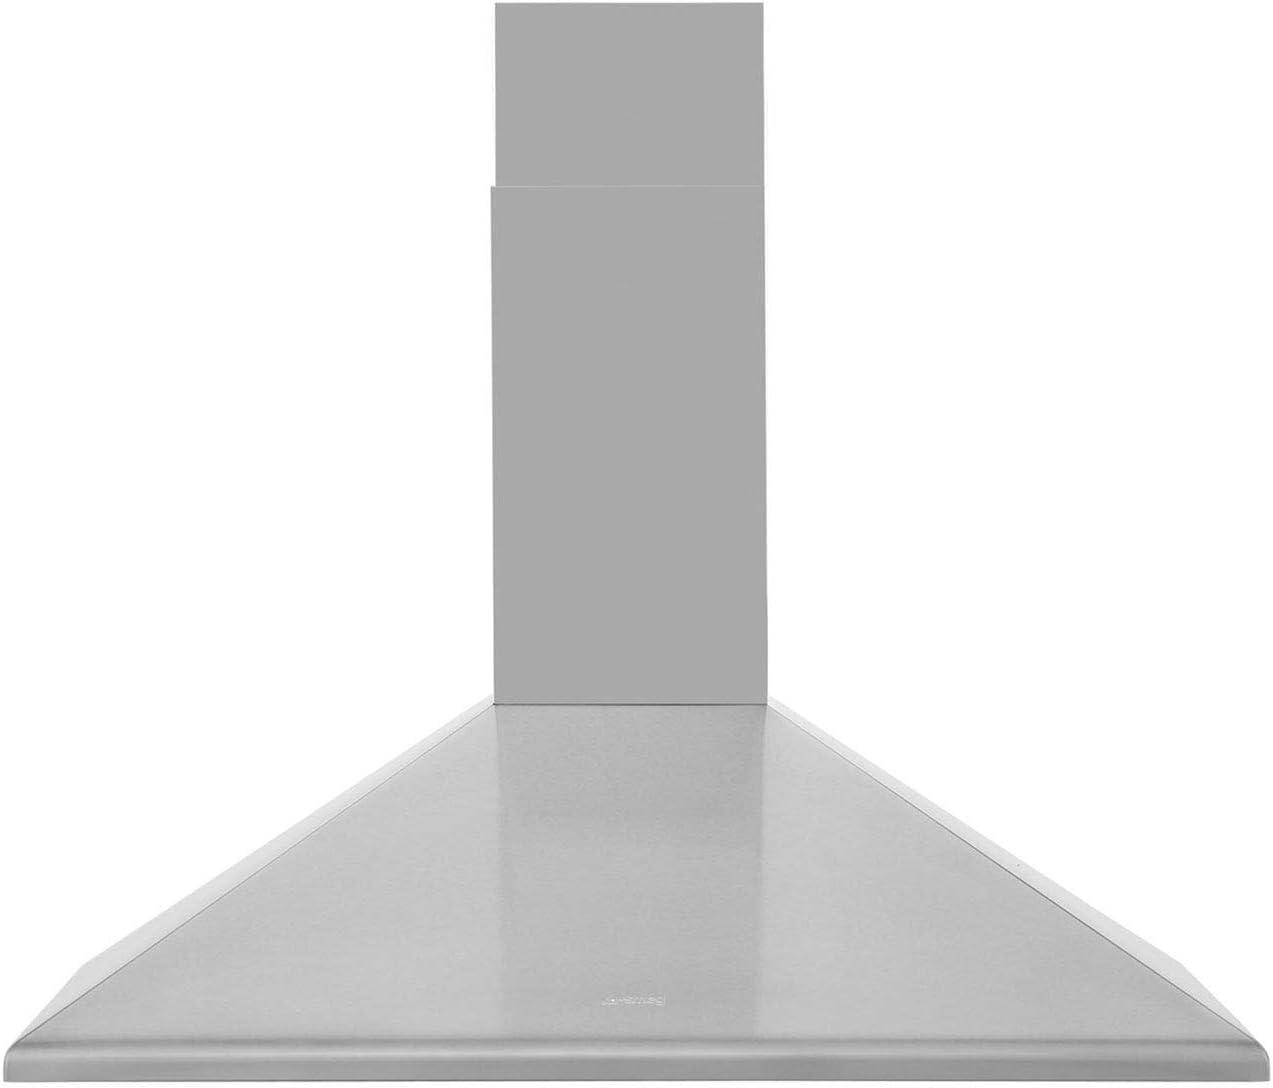 Smeg KSED95XE - Campana (588 m³/h, Canalizado/Recirculación, B, A, D, 65 dB): Amazon.es: Hogar